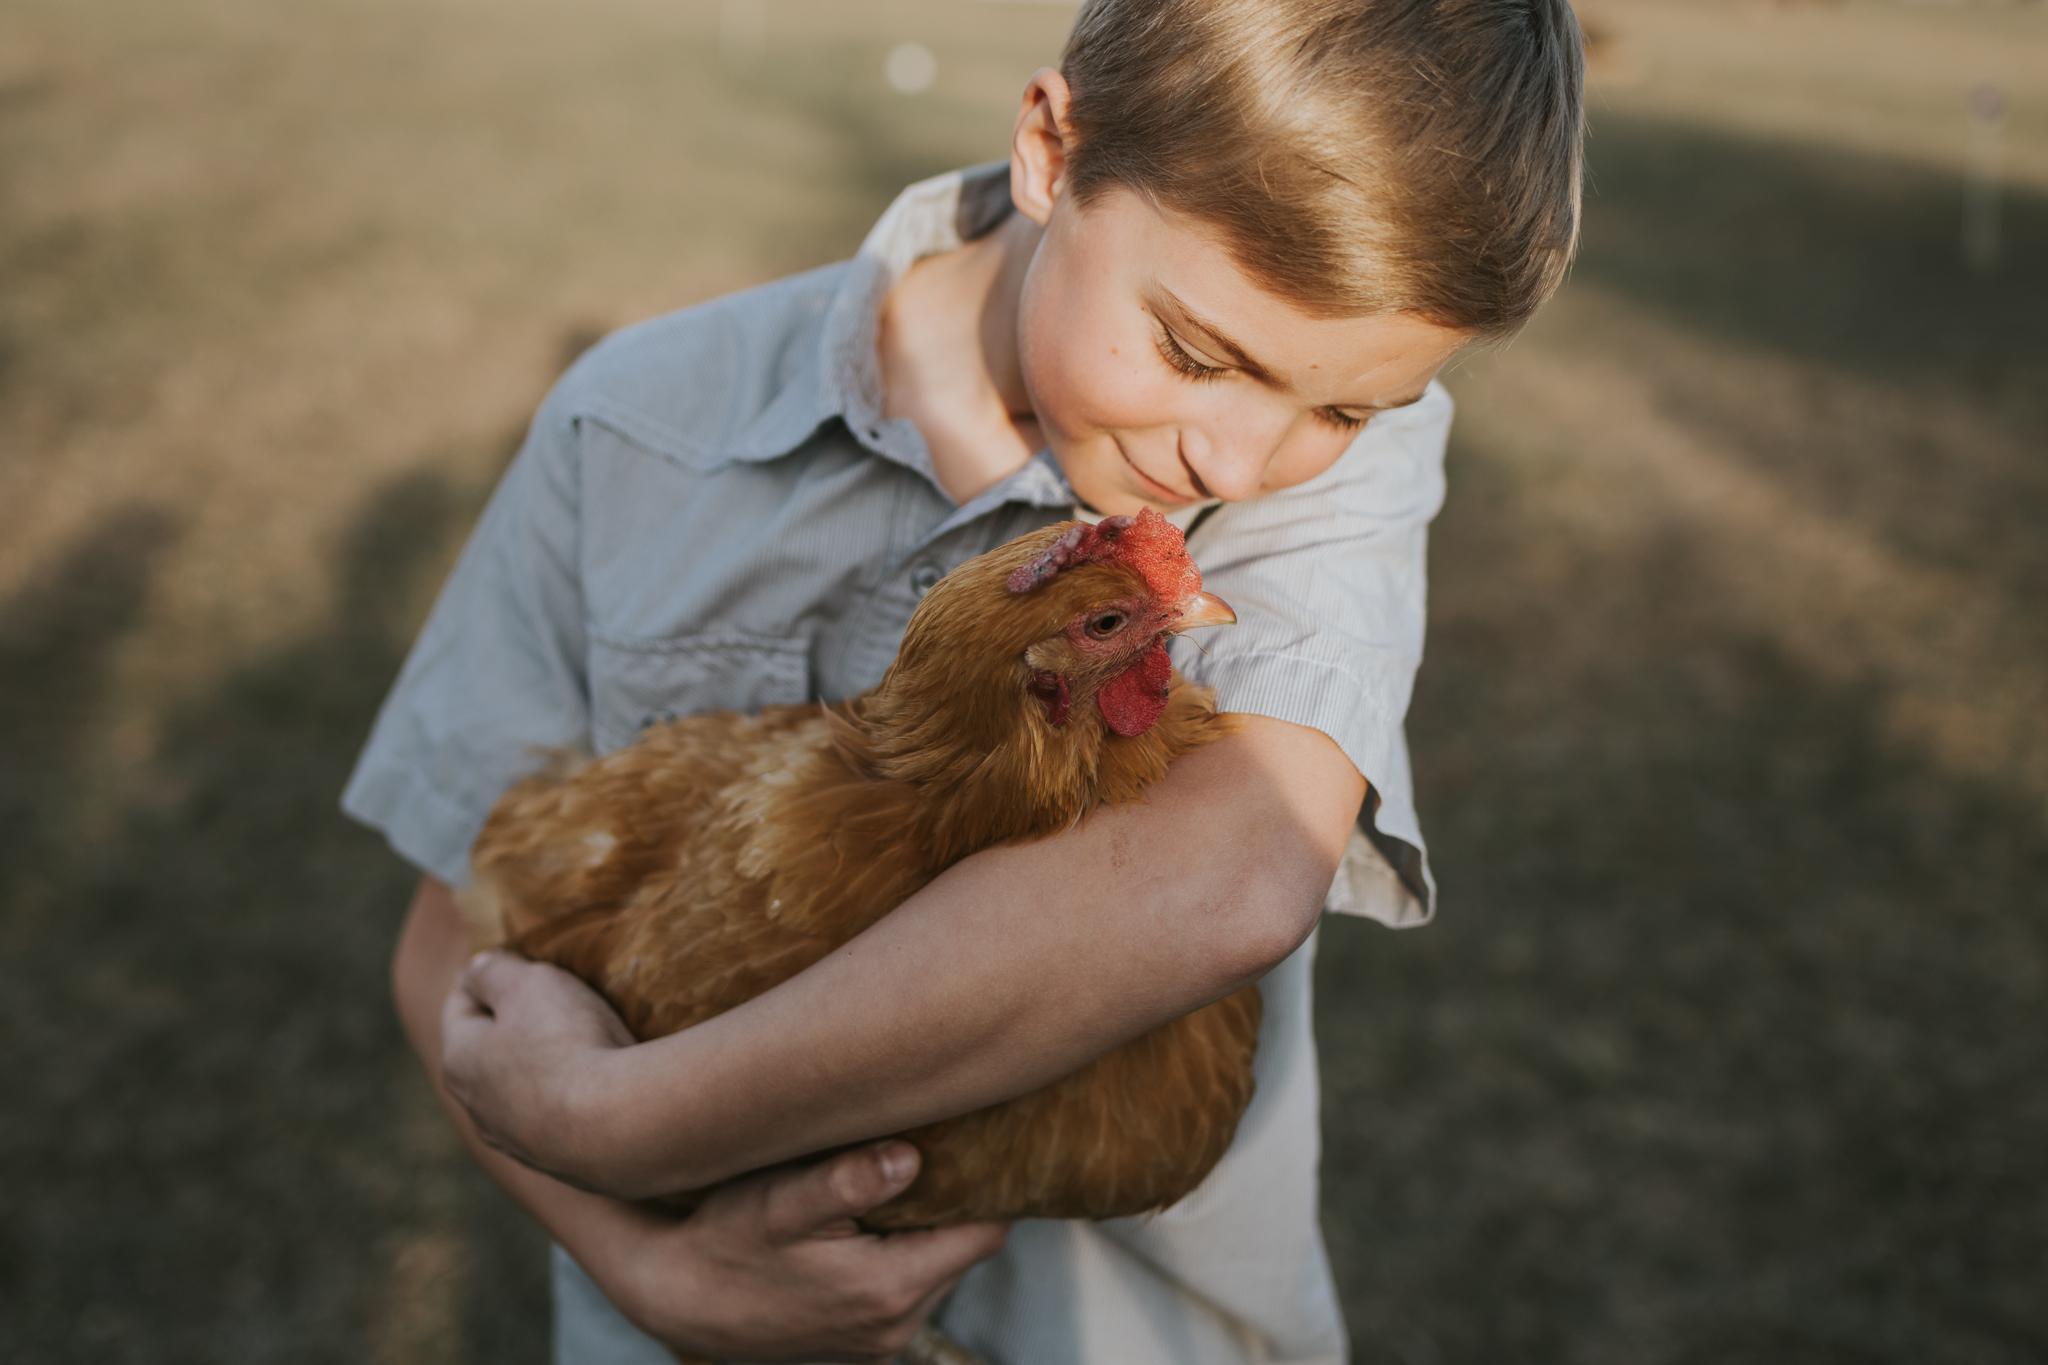 little boy holding a chicken - Minnetonka Family Photographer